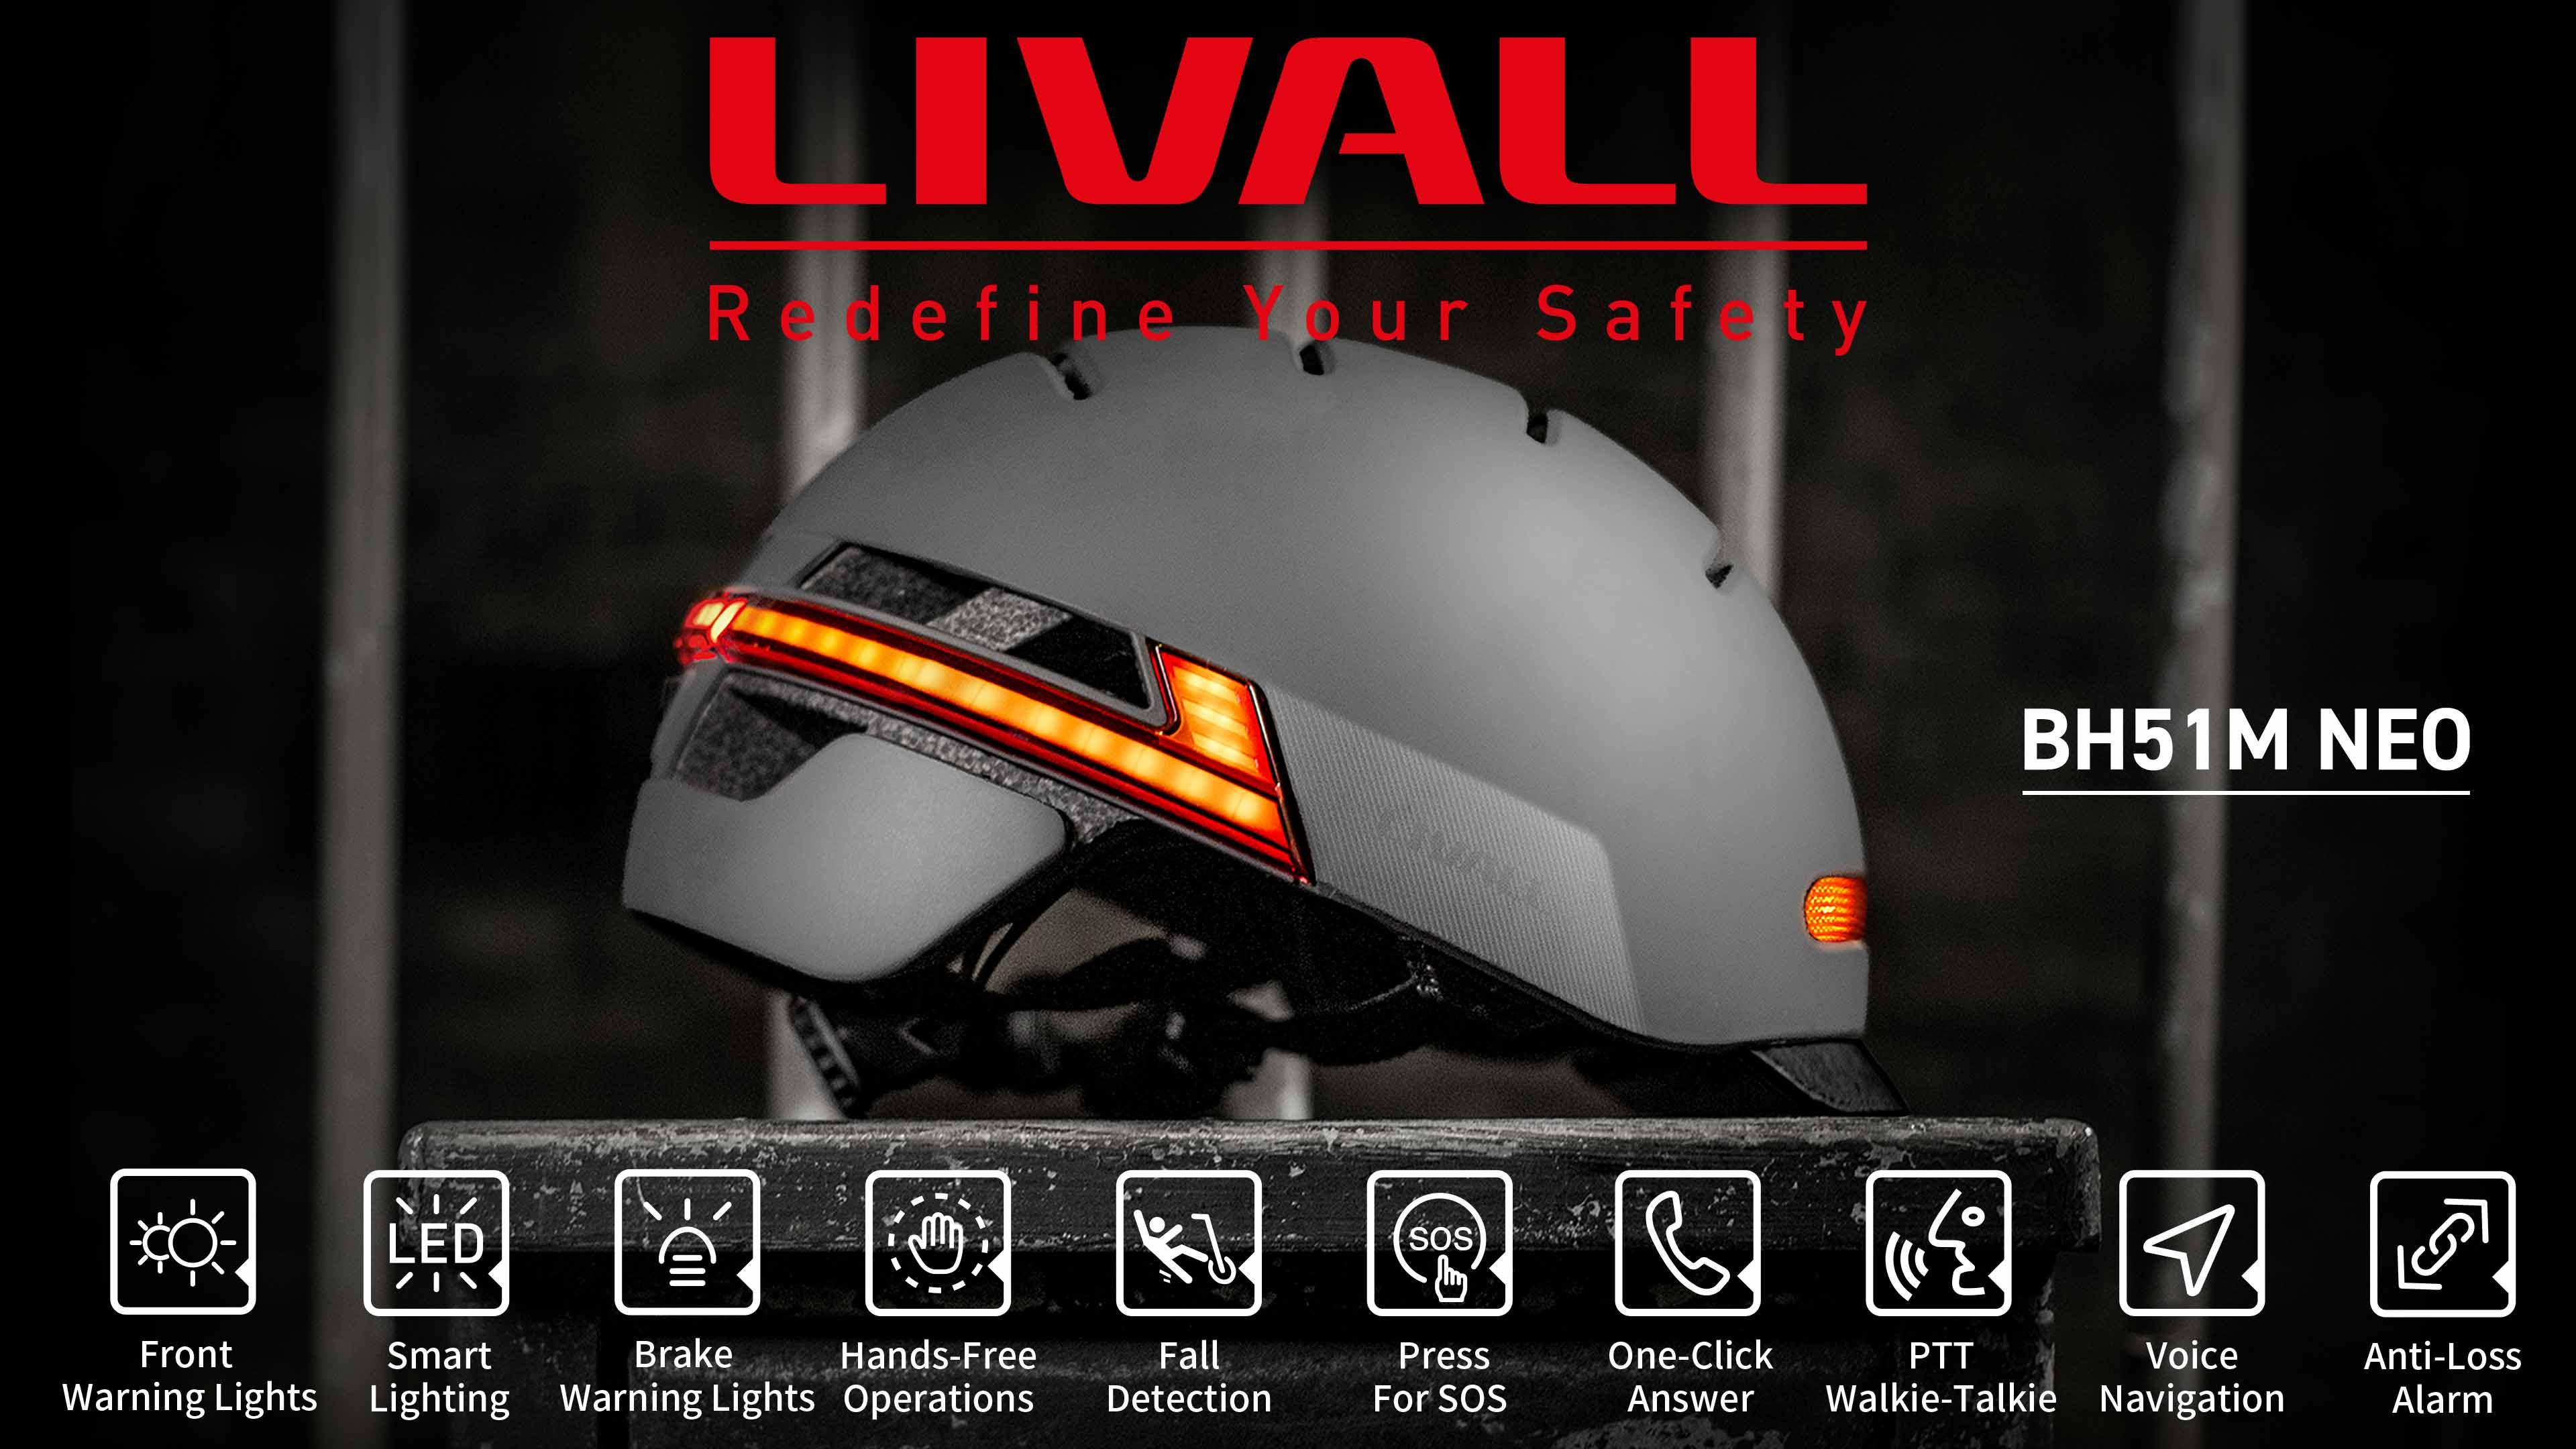 LIVALL BH51M NEO